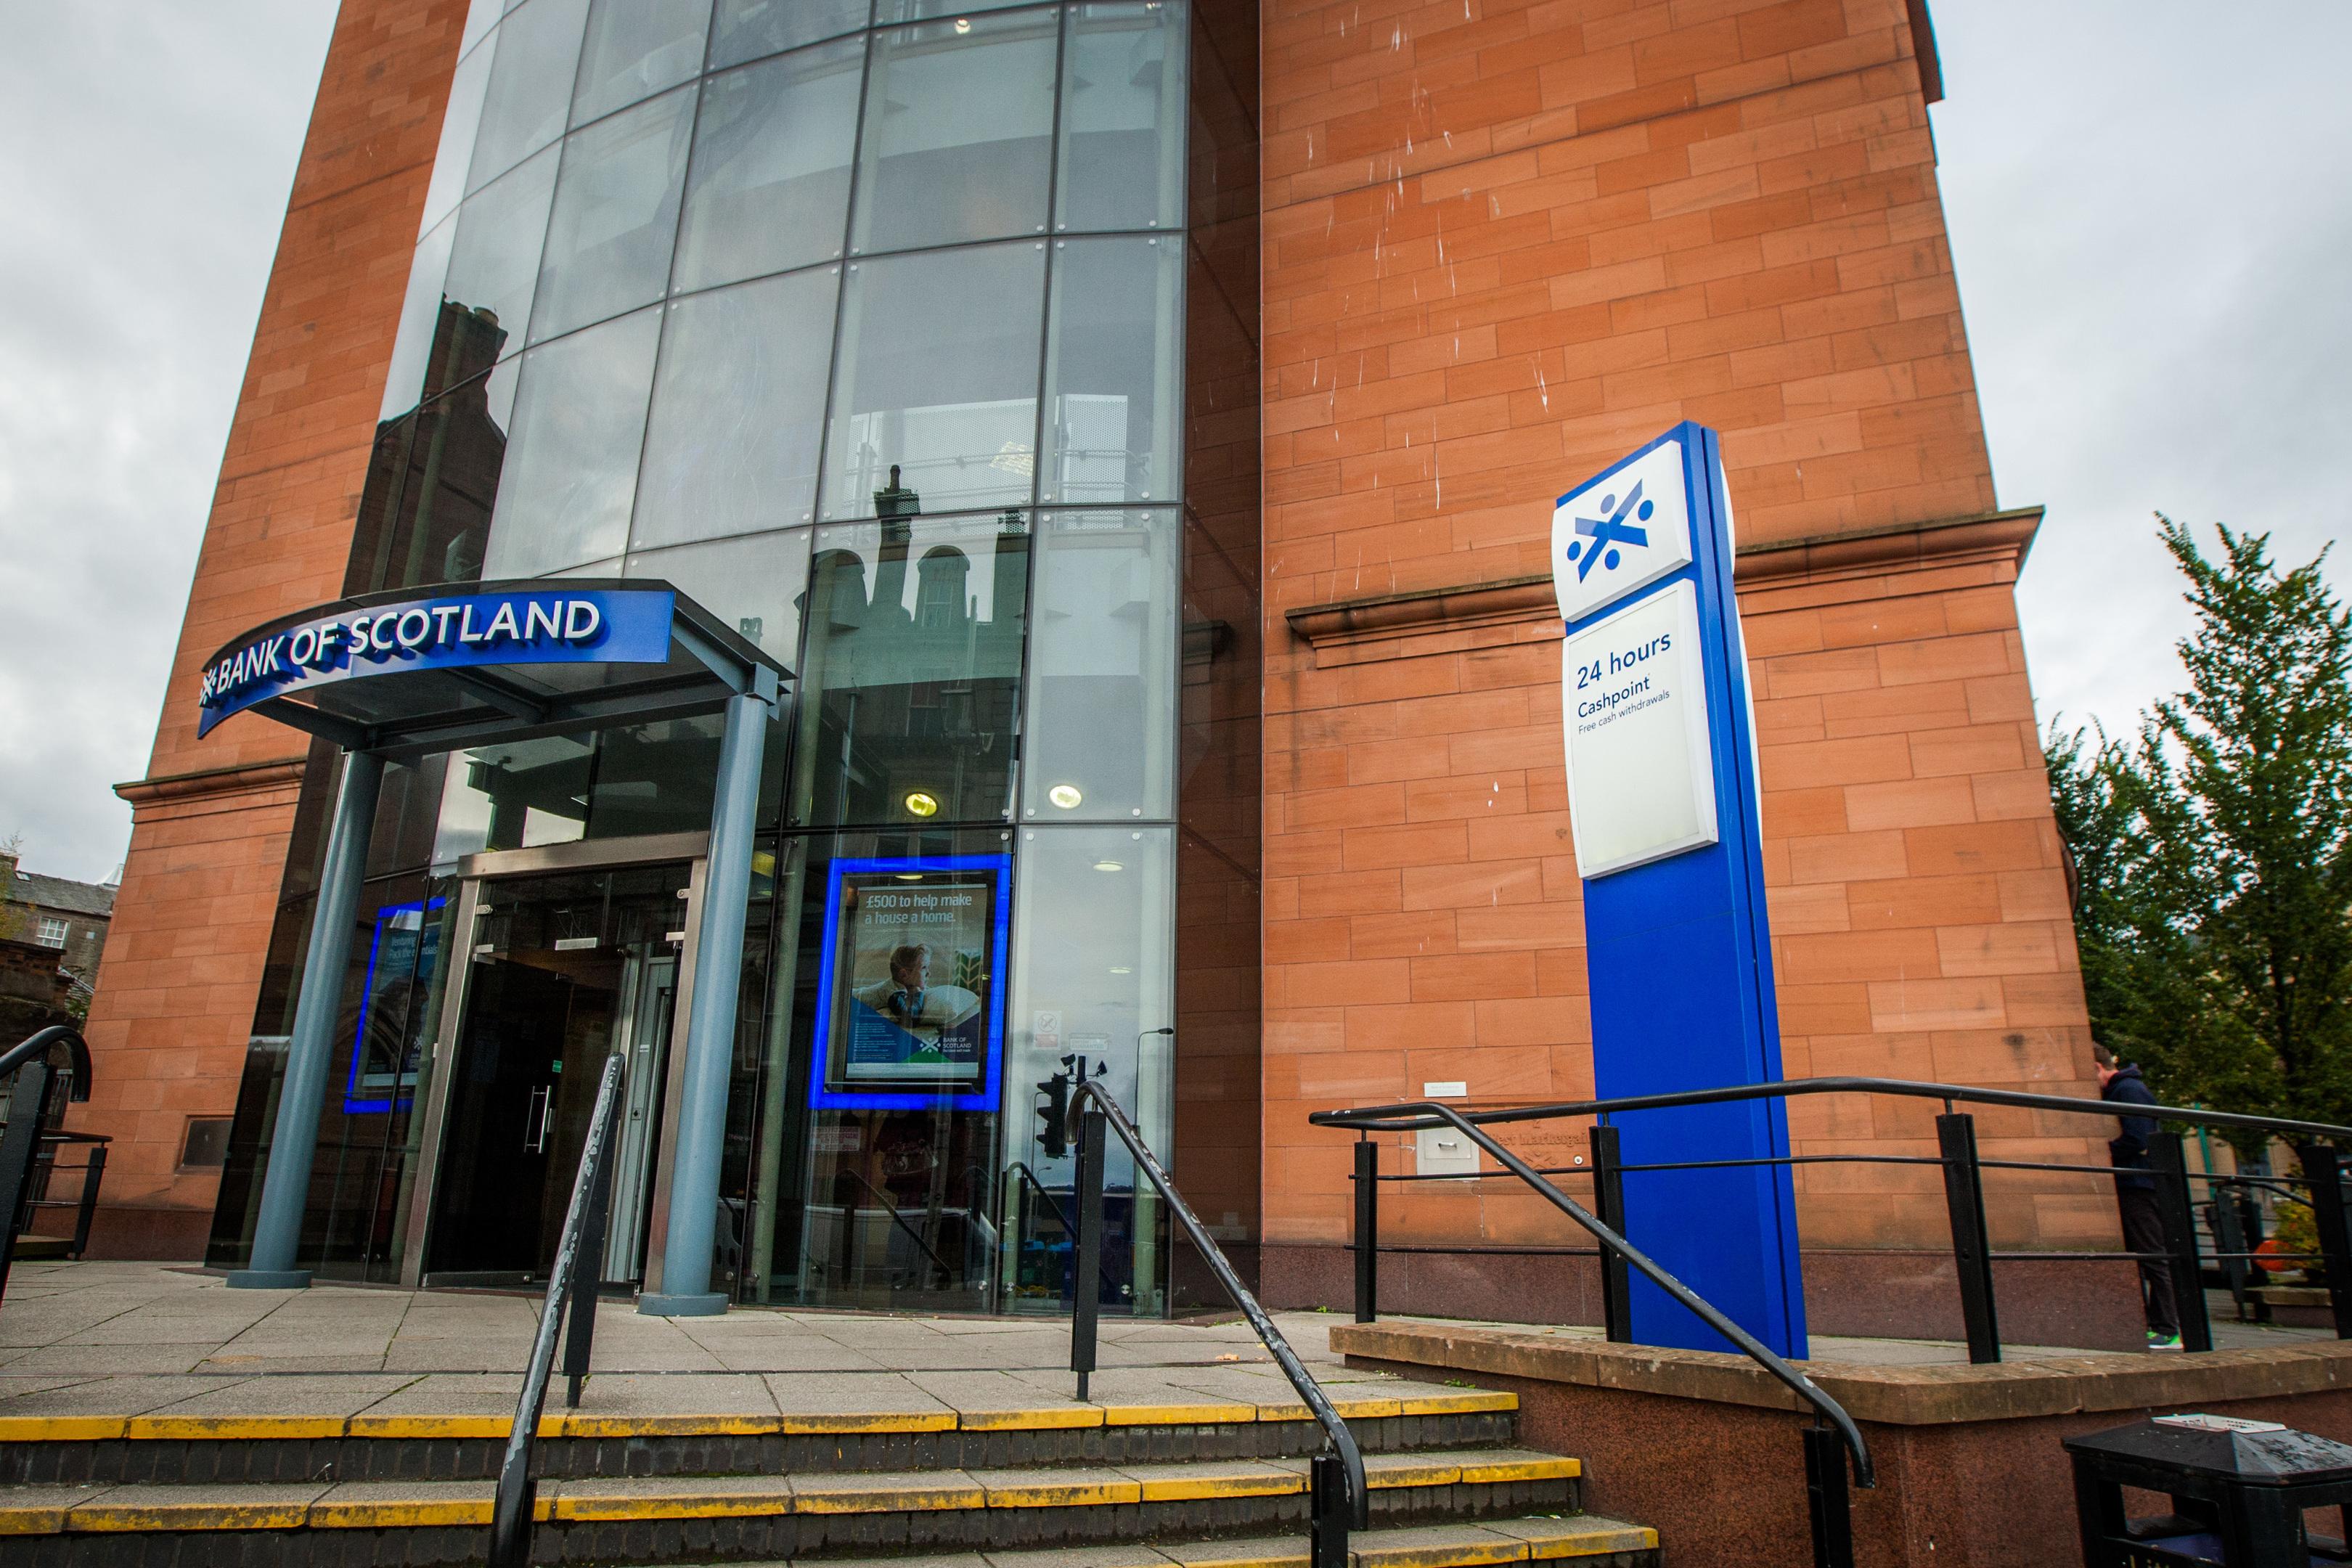 The Bank of Scotland branch in Marketgait.